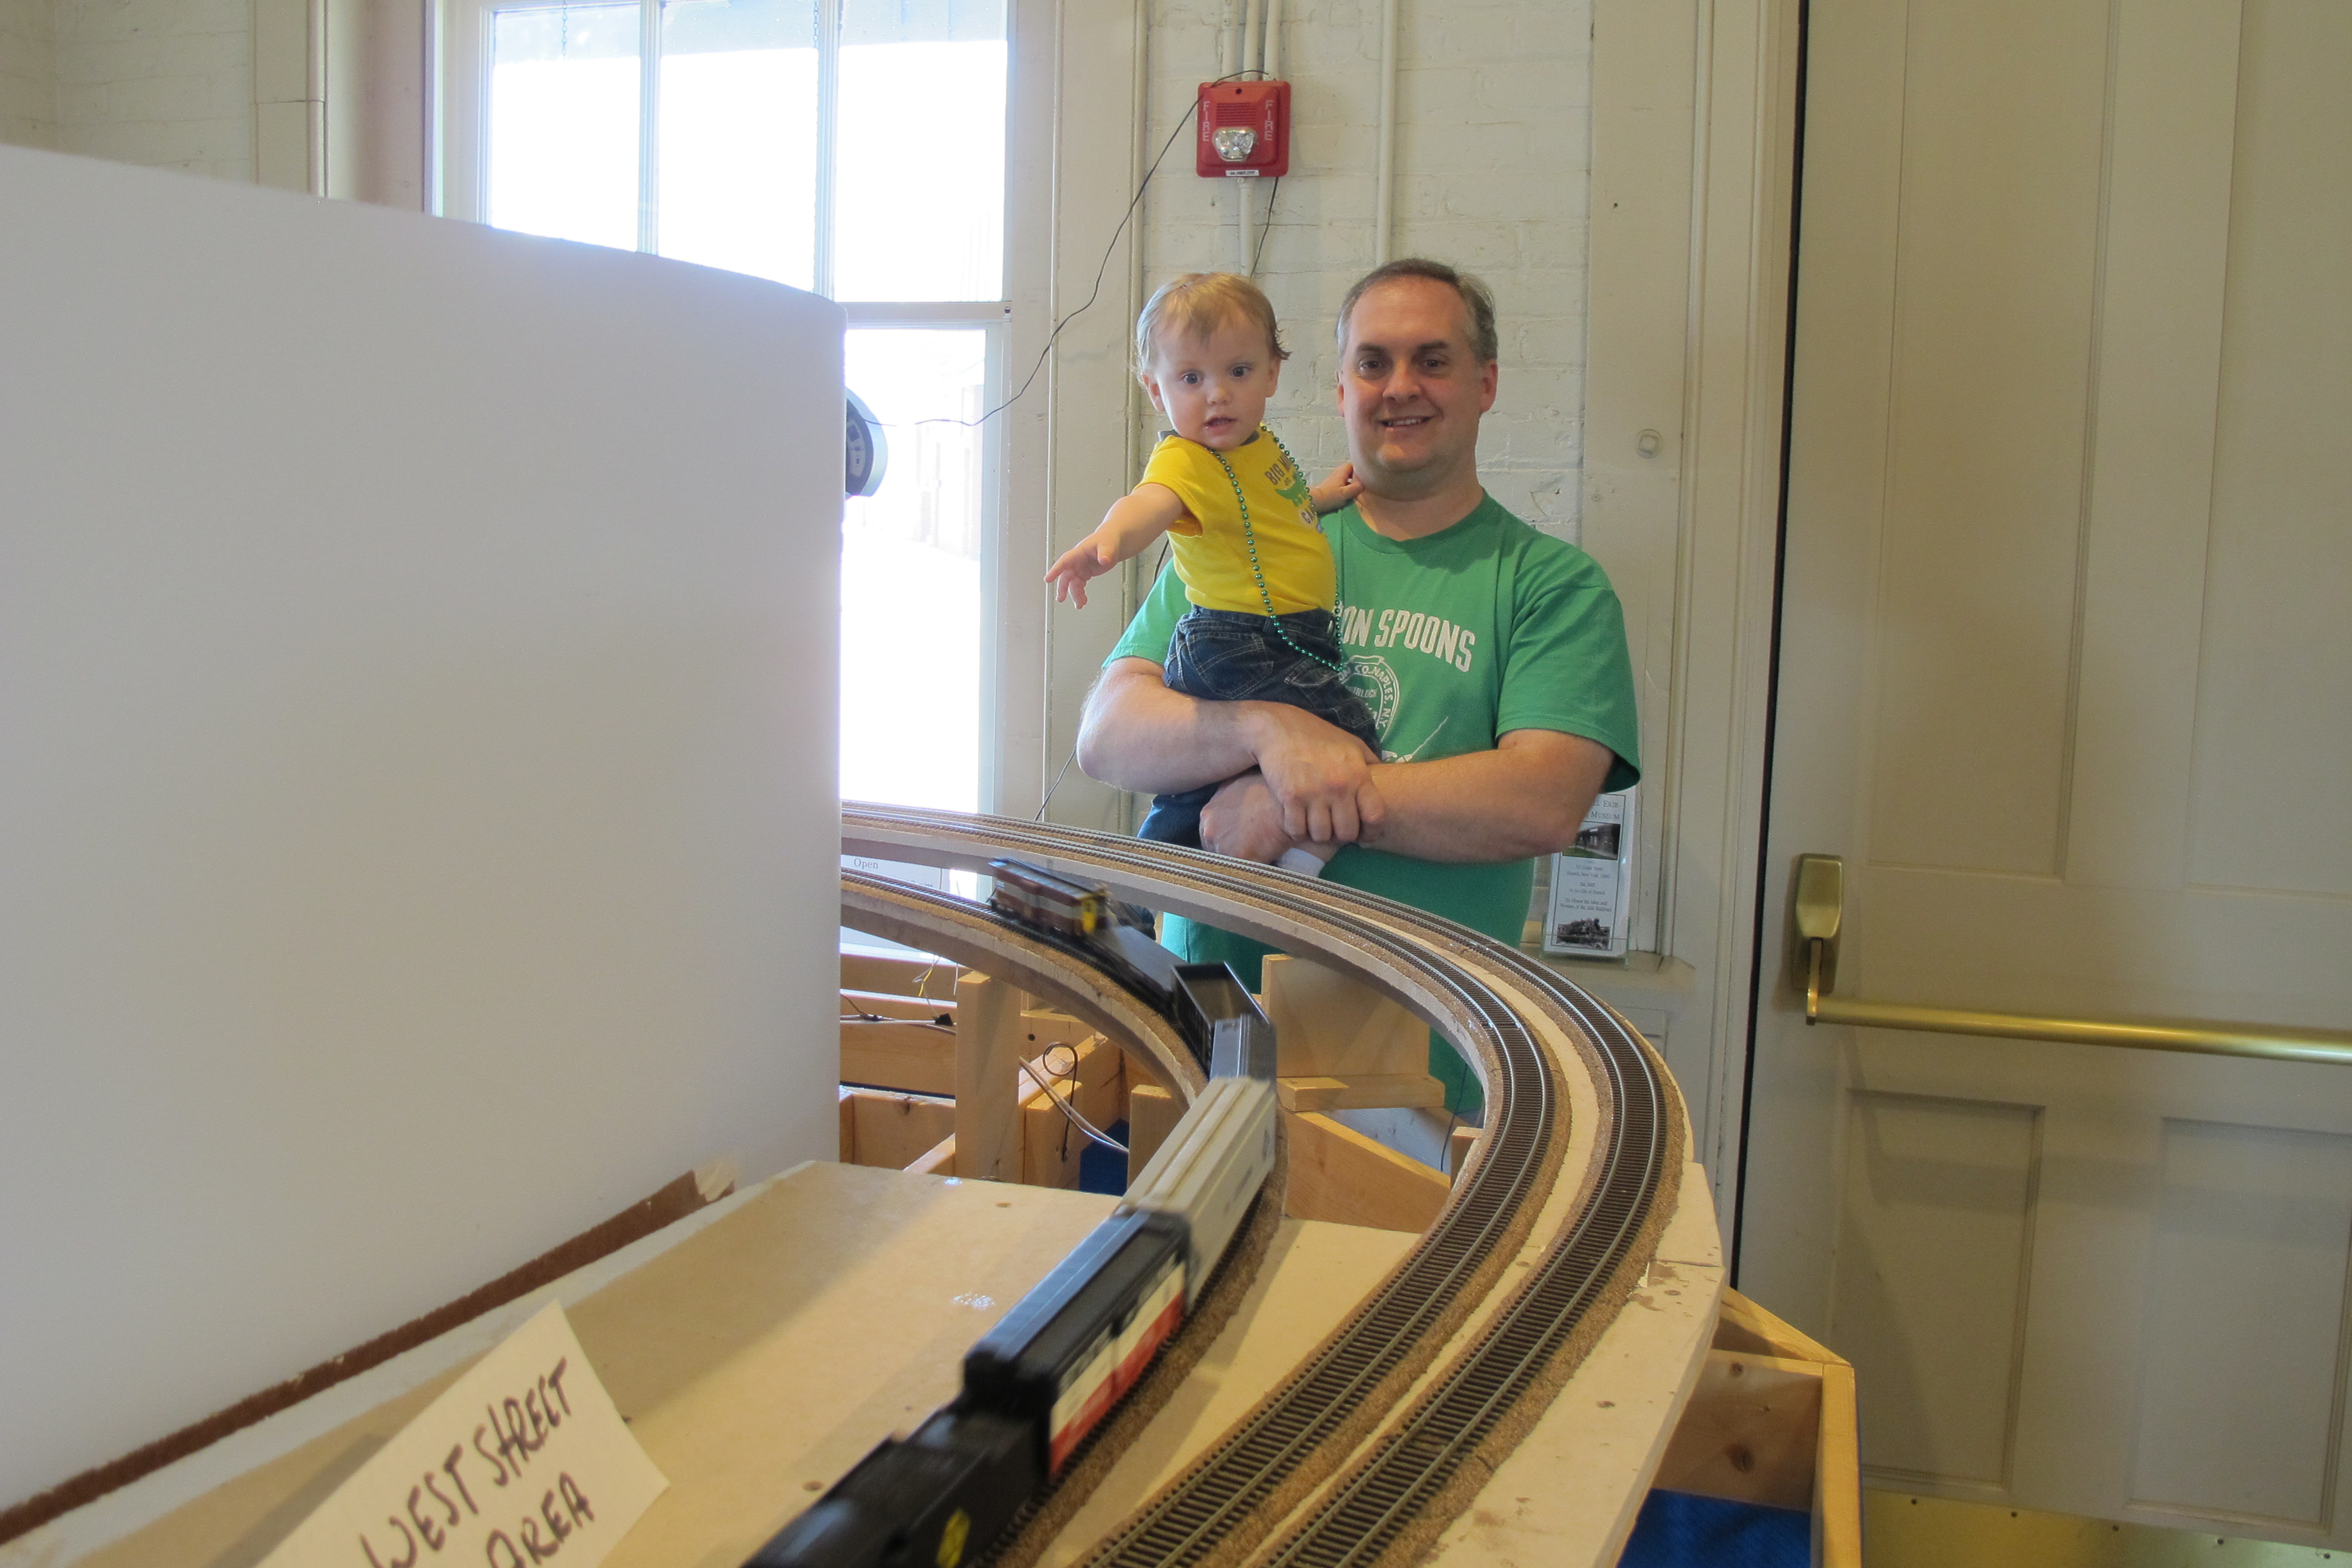 Watching the model train